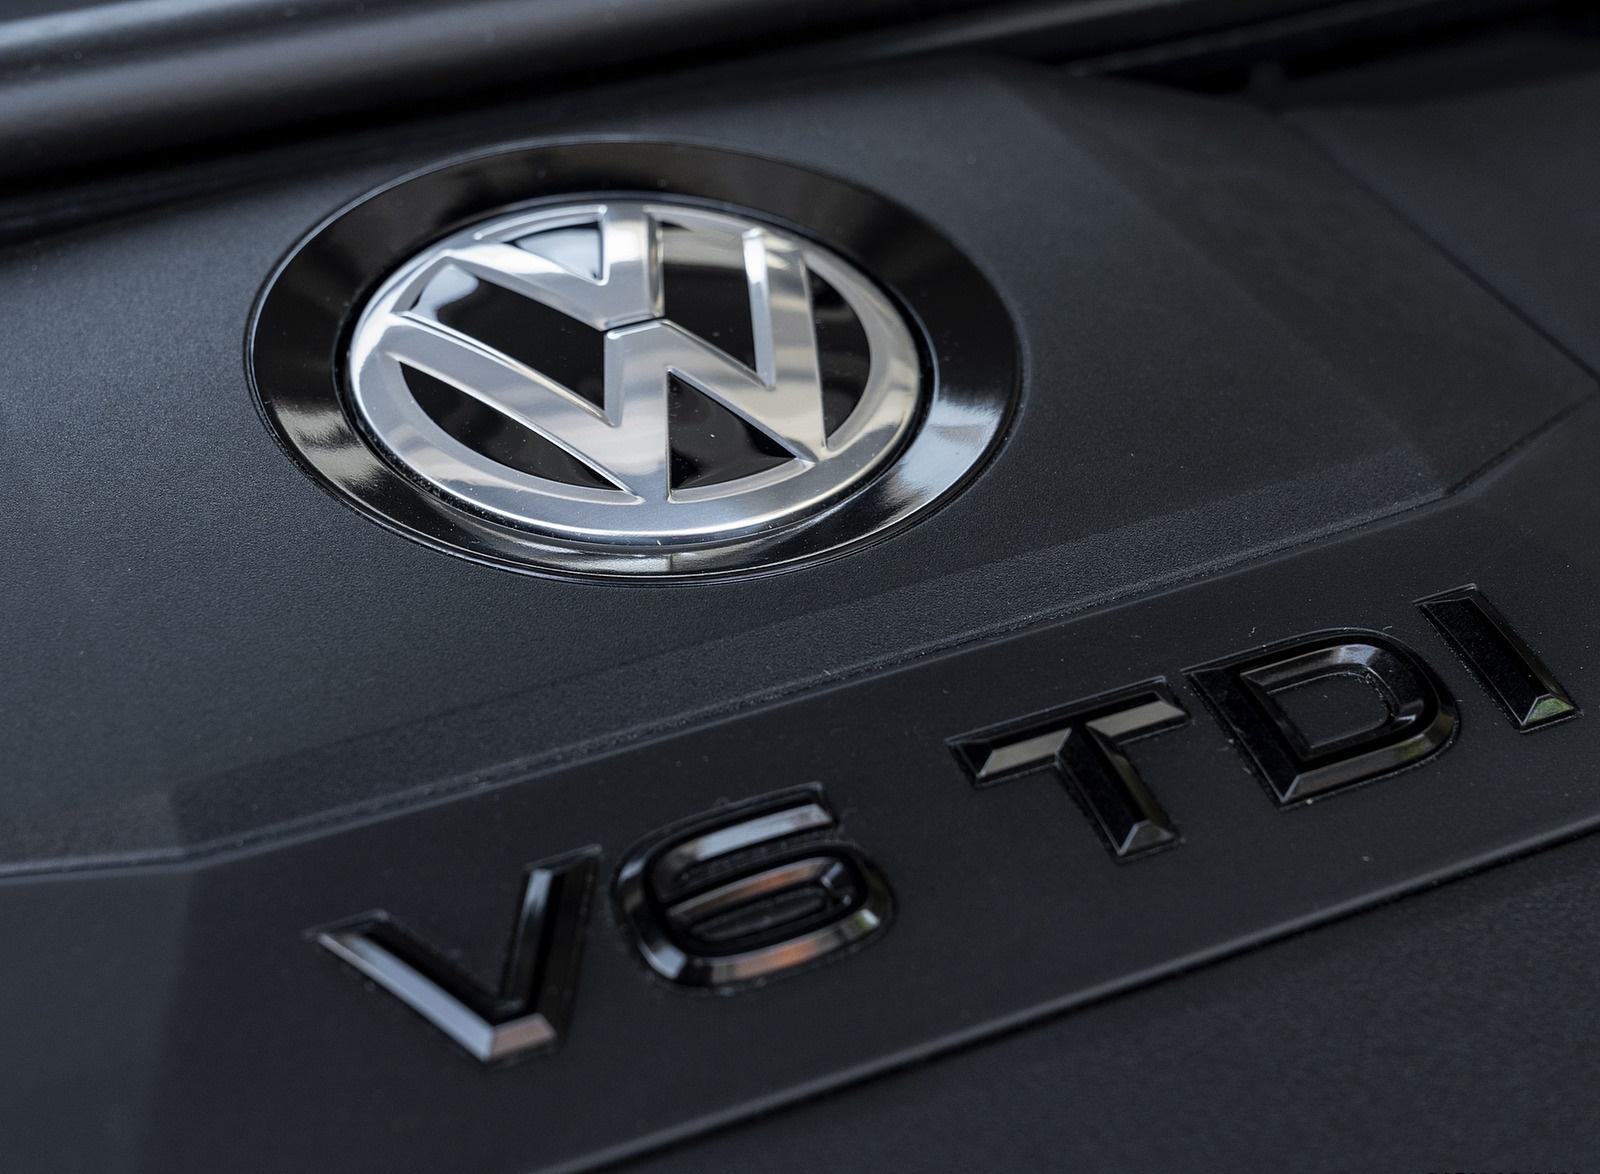 2019 Volkswagen Touareg V6 TDI R-Line (UK-Spec) Engine Wallpapers #34 of 43